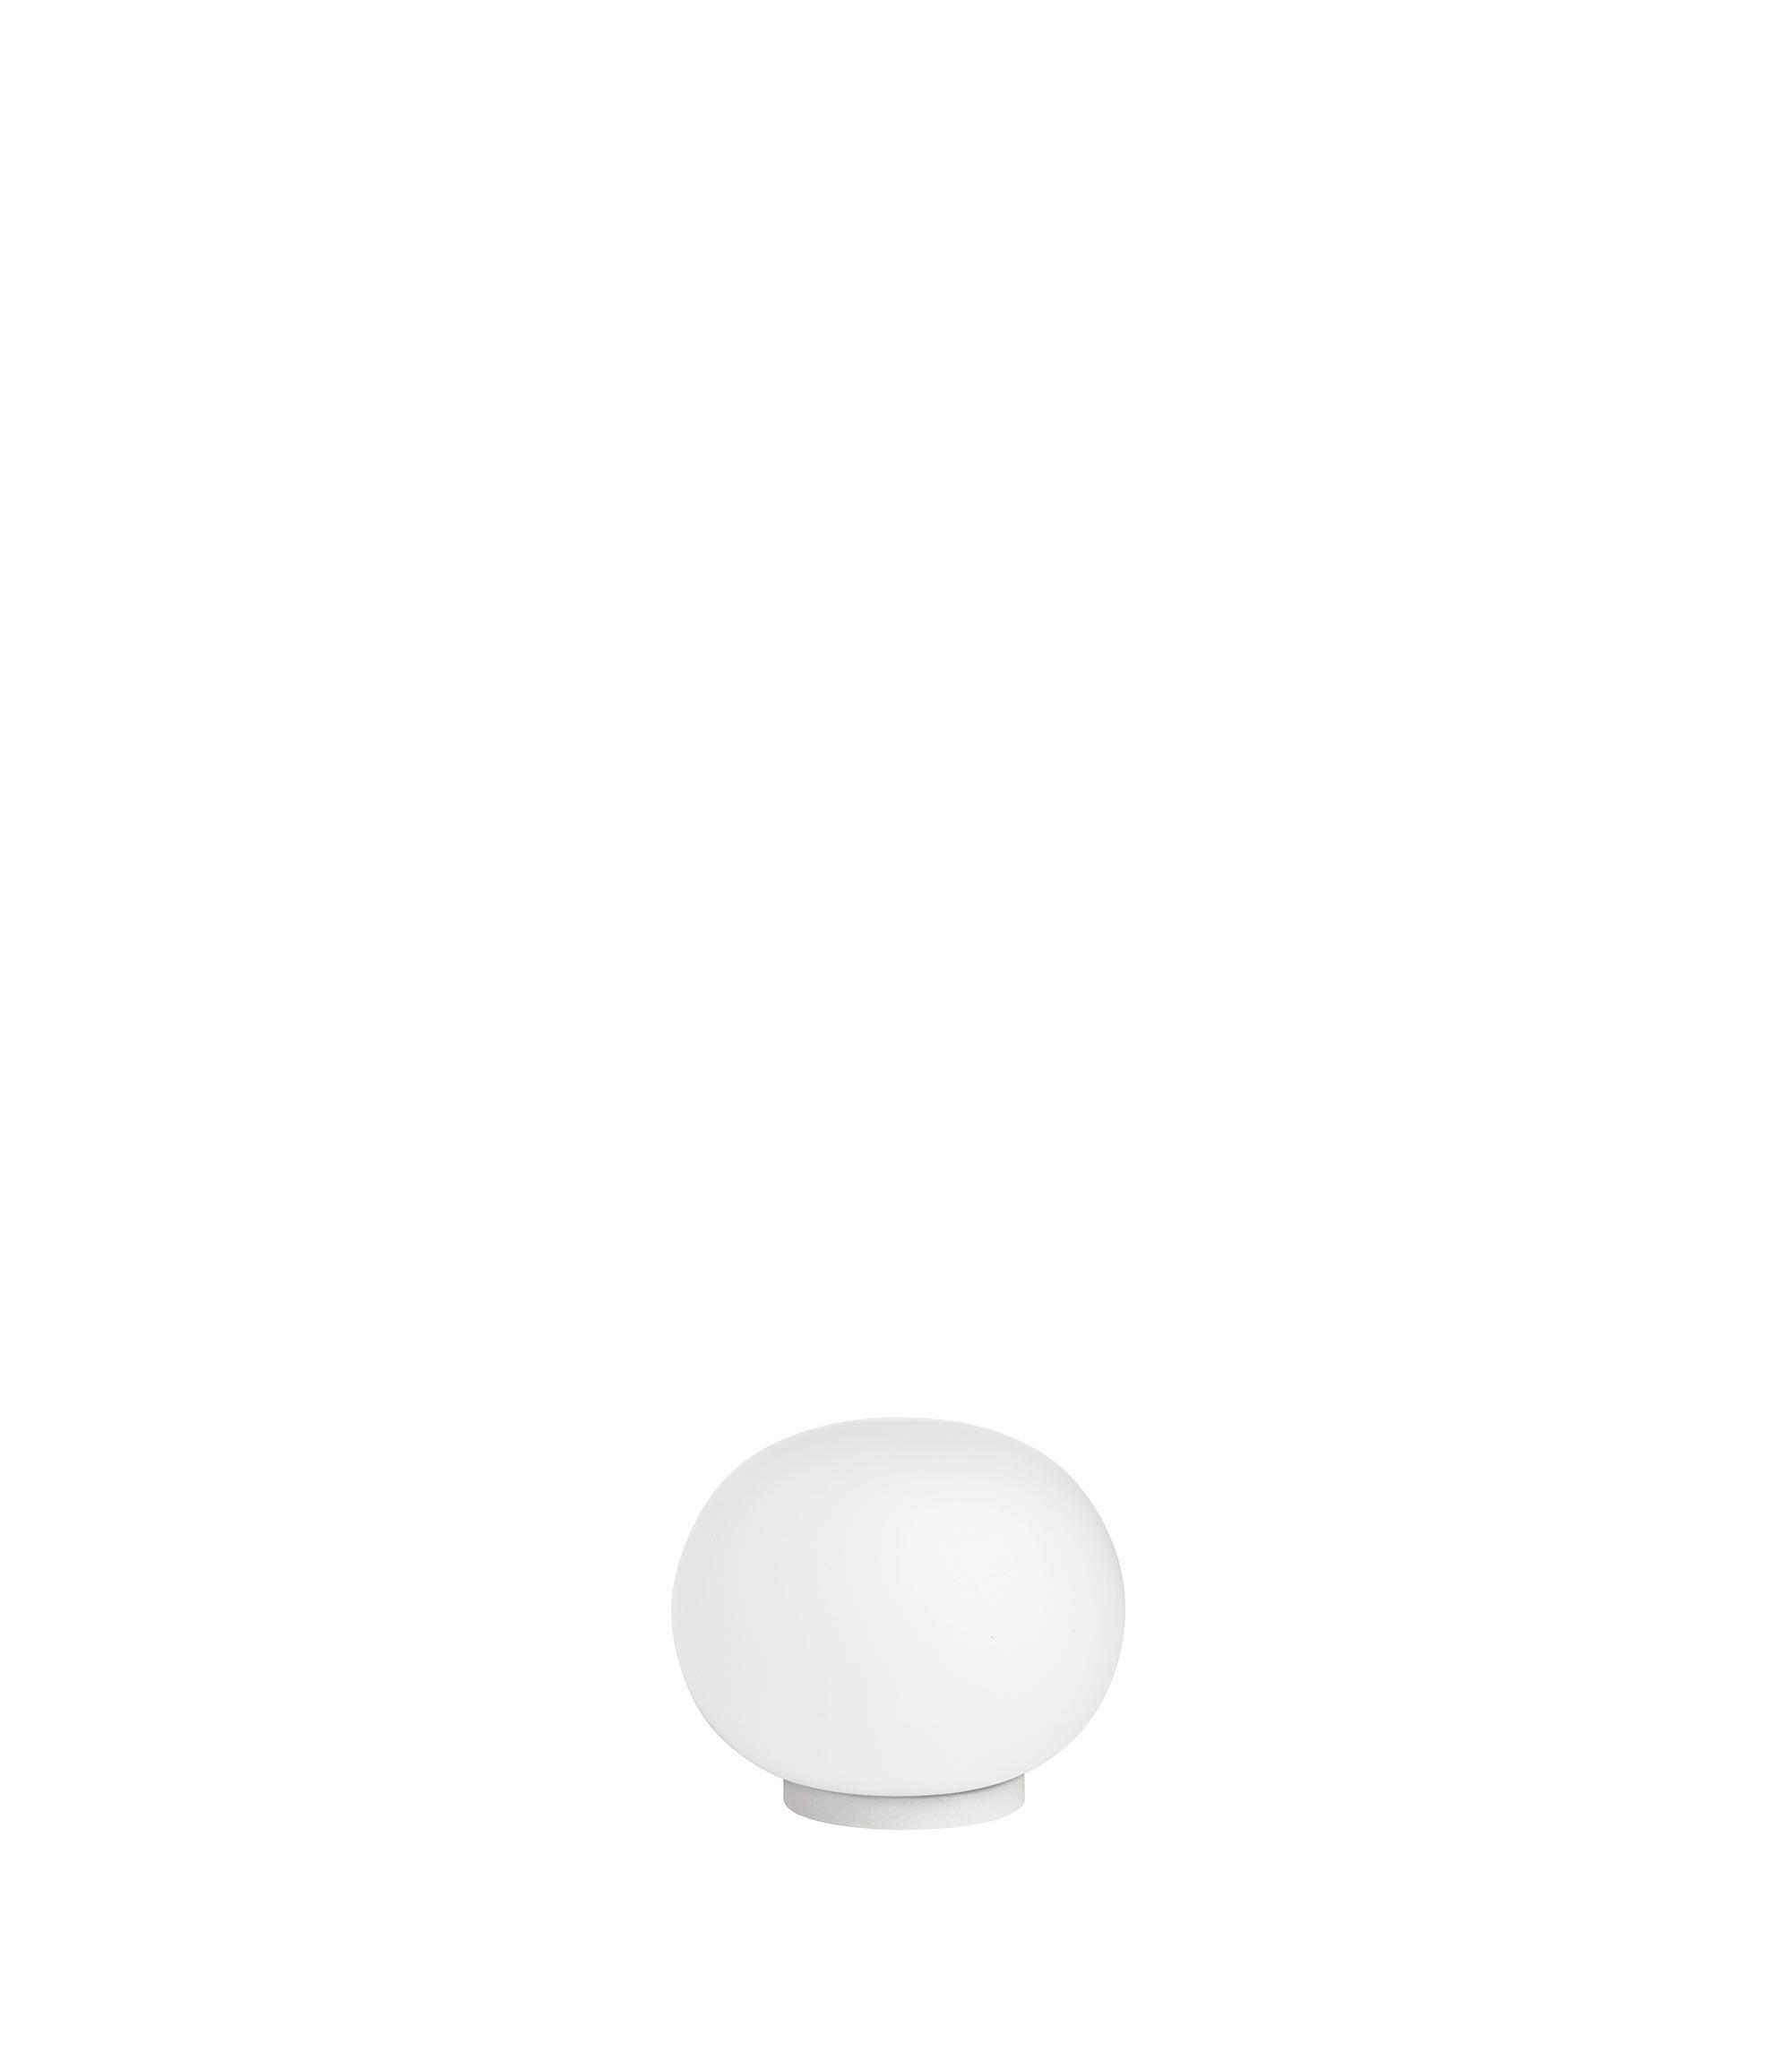 Glo ball table mini morrison flos F4191009 product still life big 1